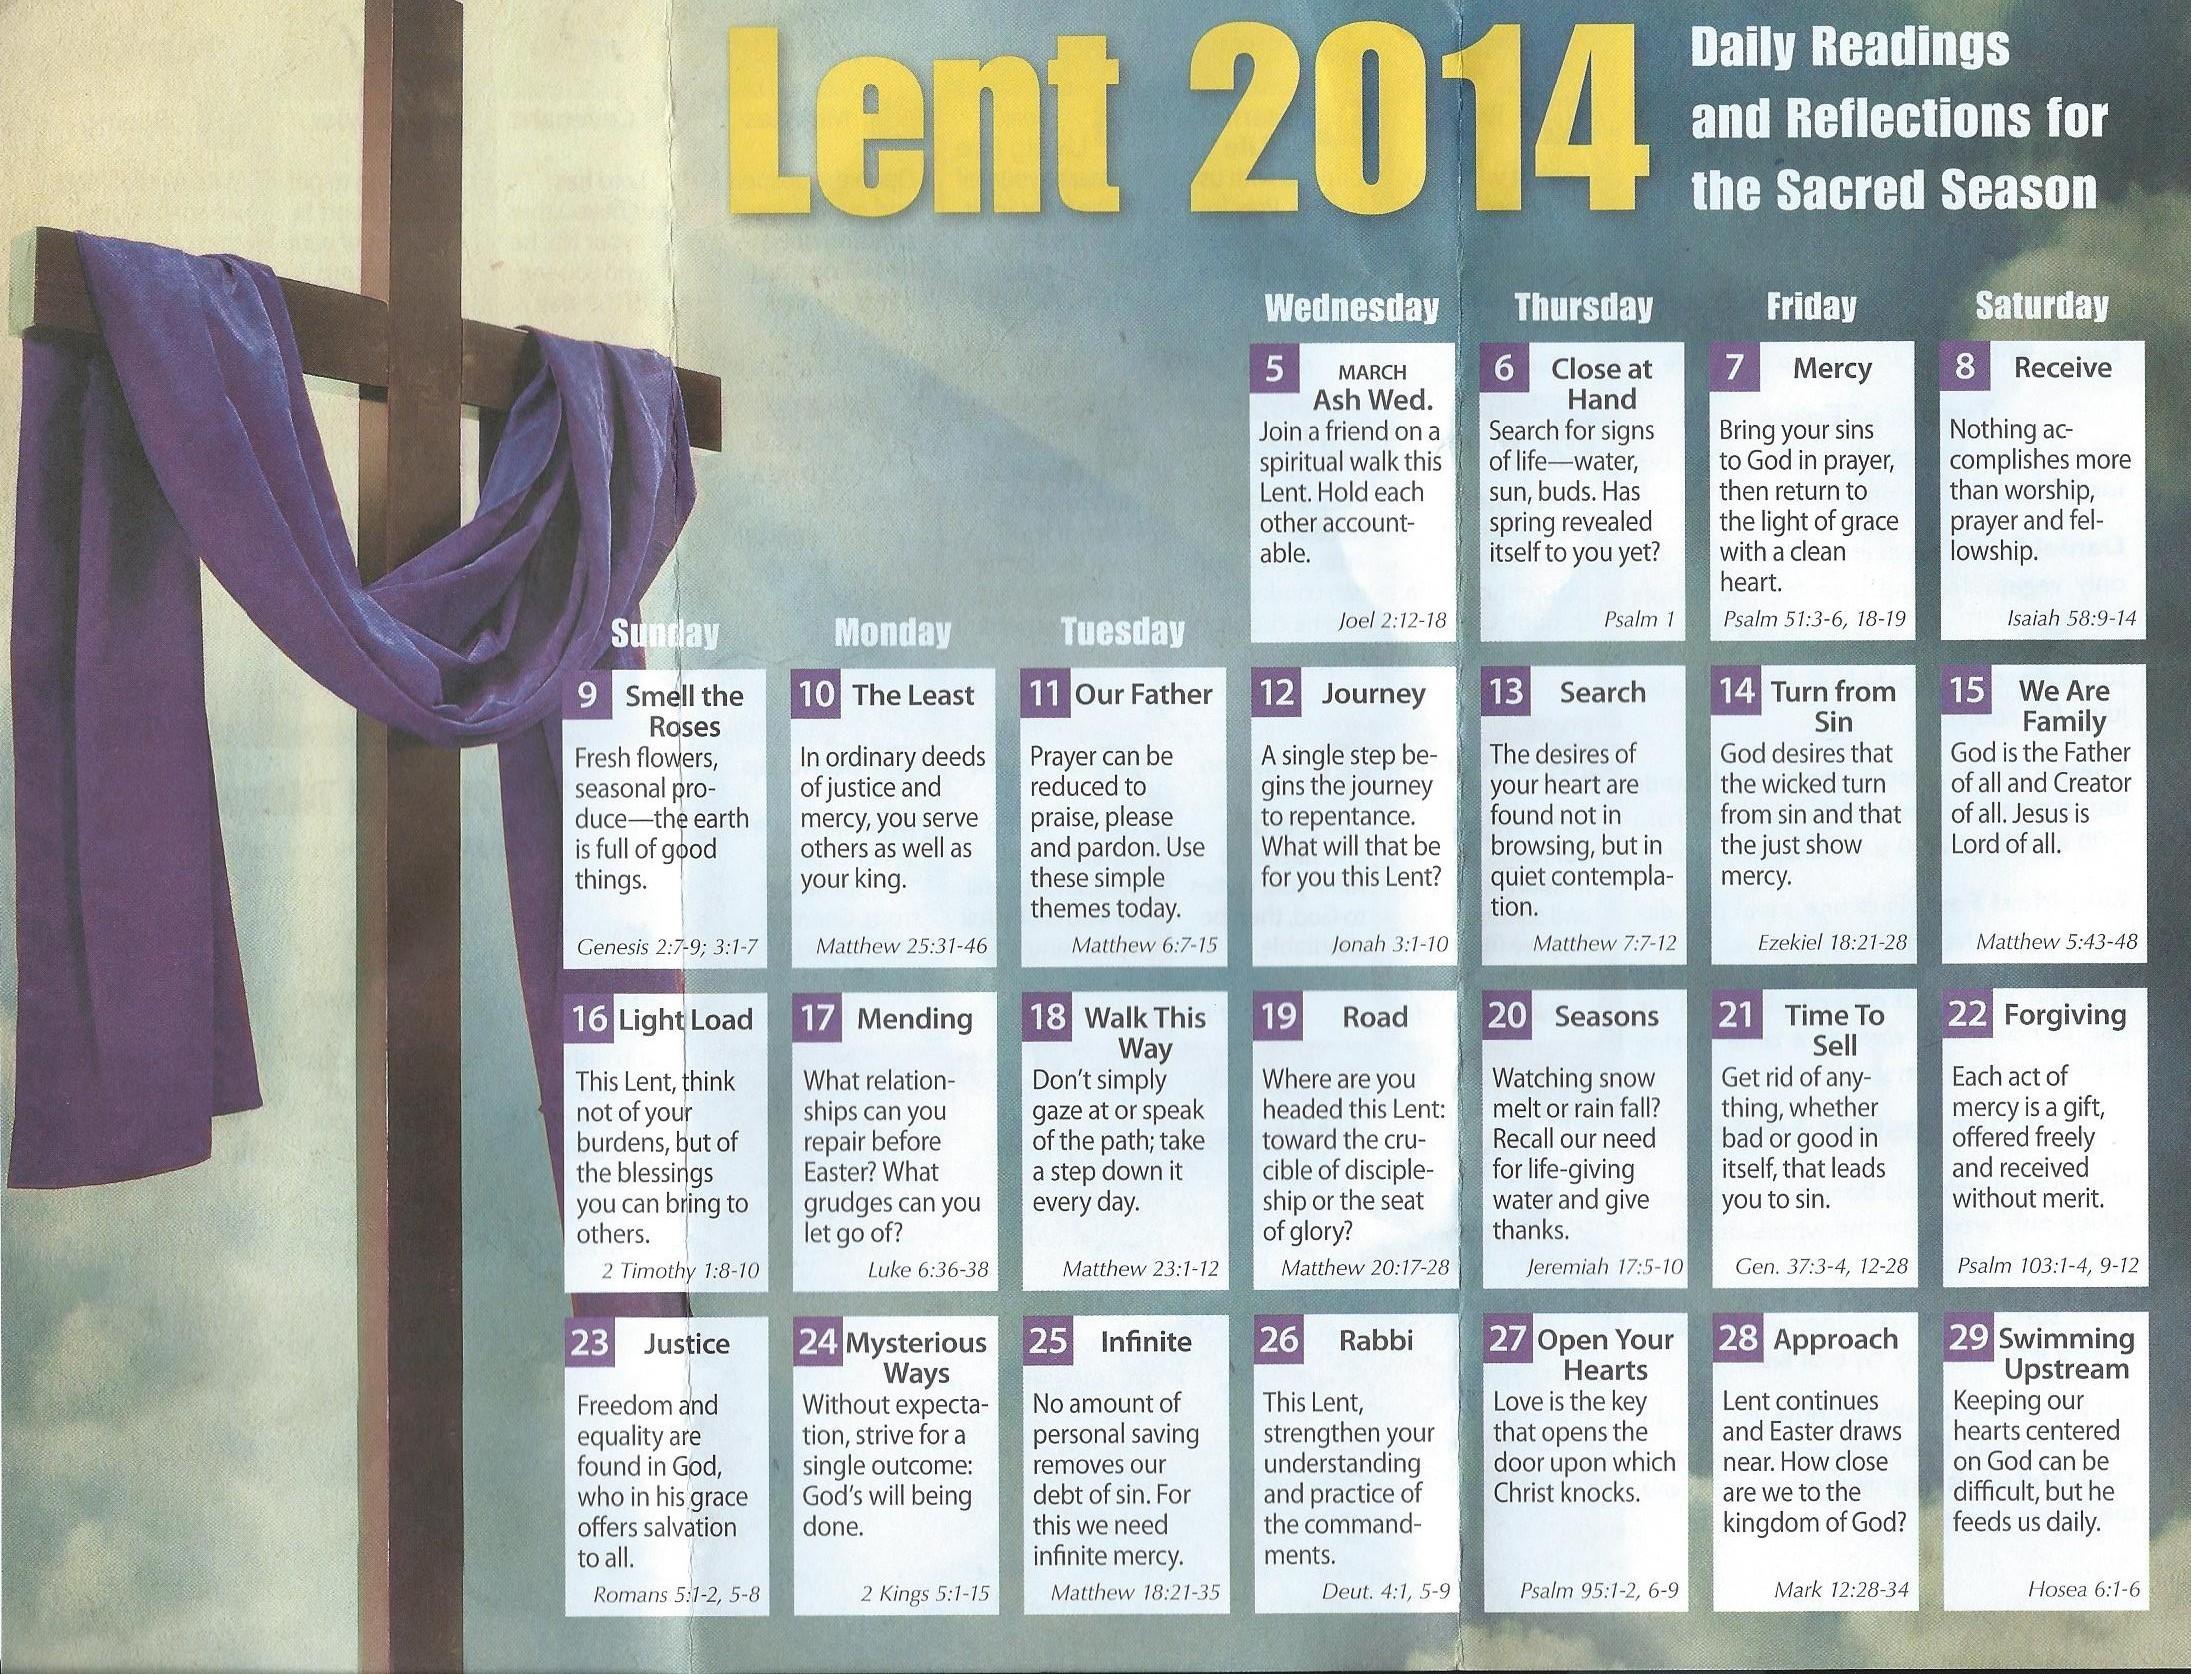 Lent Season Calendar - St. Matthews United Methodist Church  Methodist Lent Calendar